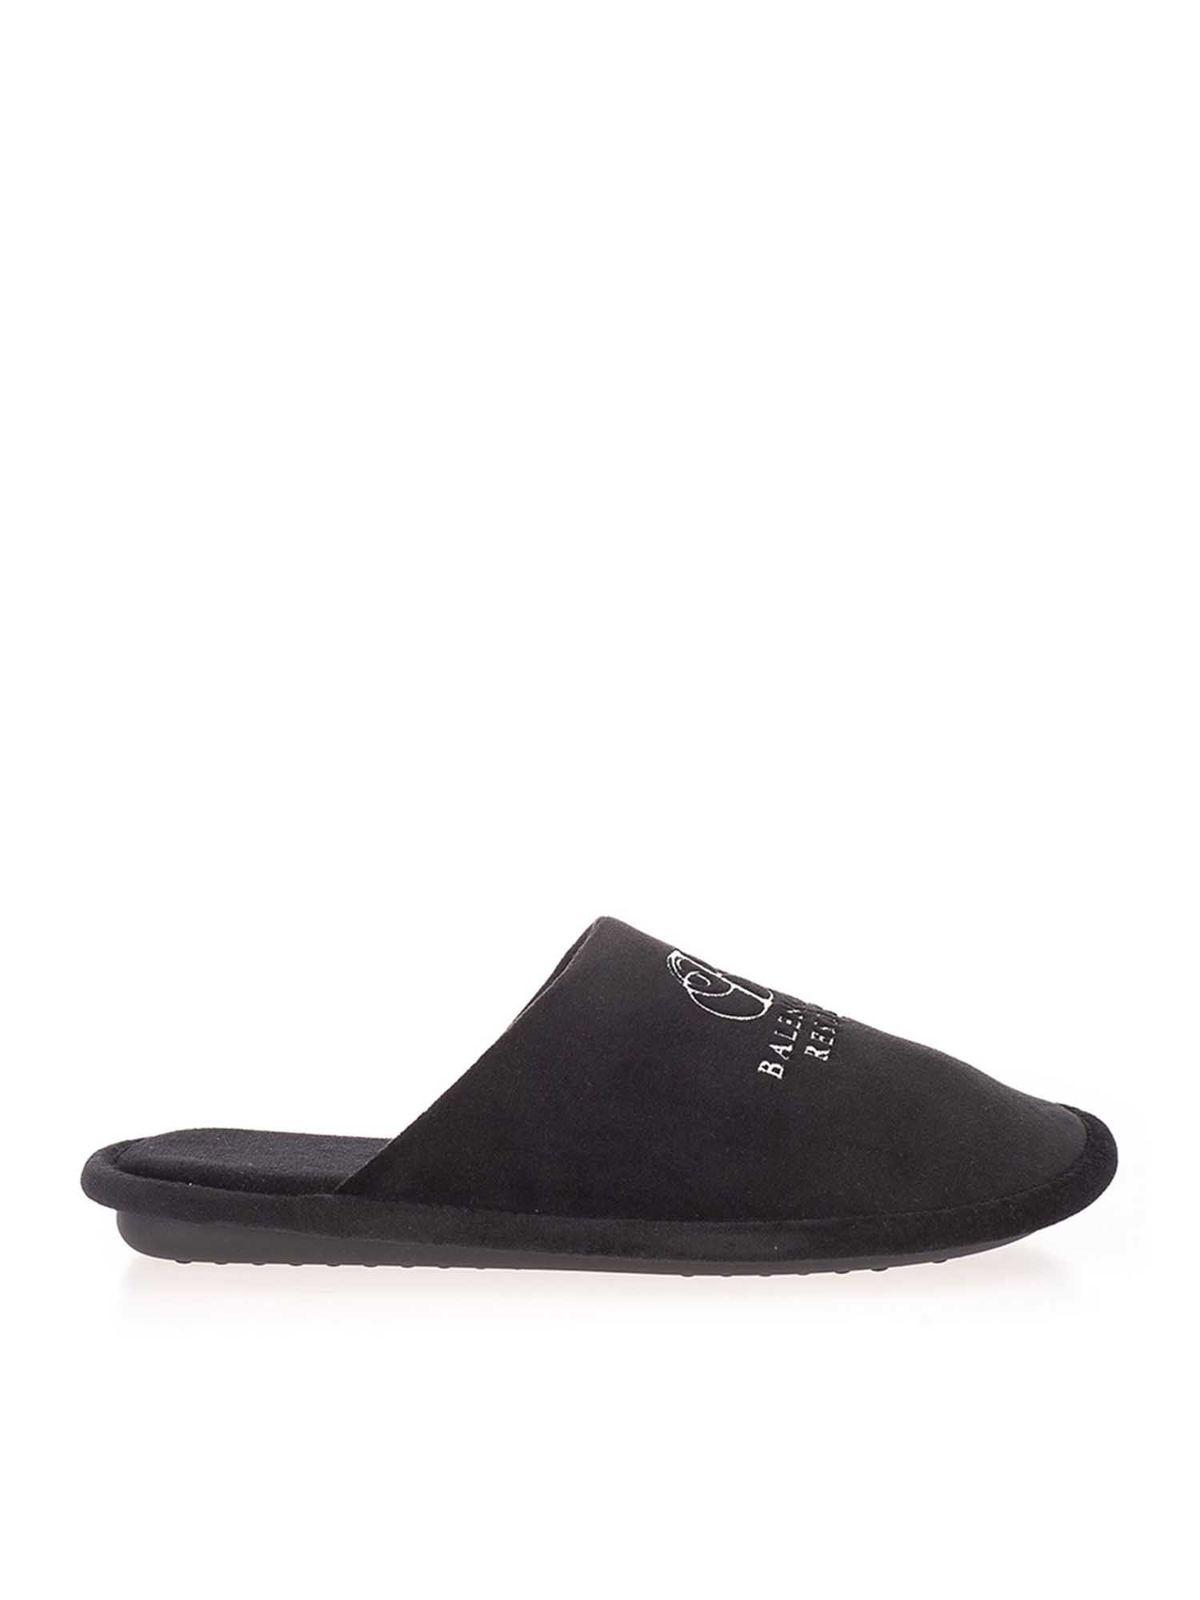 Balenciaga Velvets EMBROIDERED LOGO SLIPPERS IN BLACK